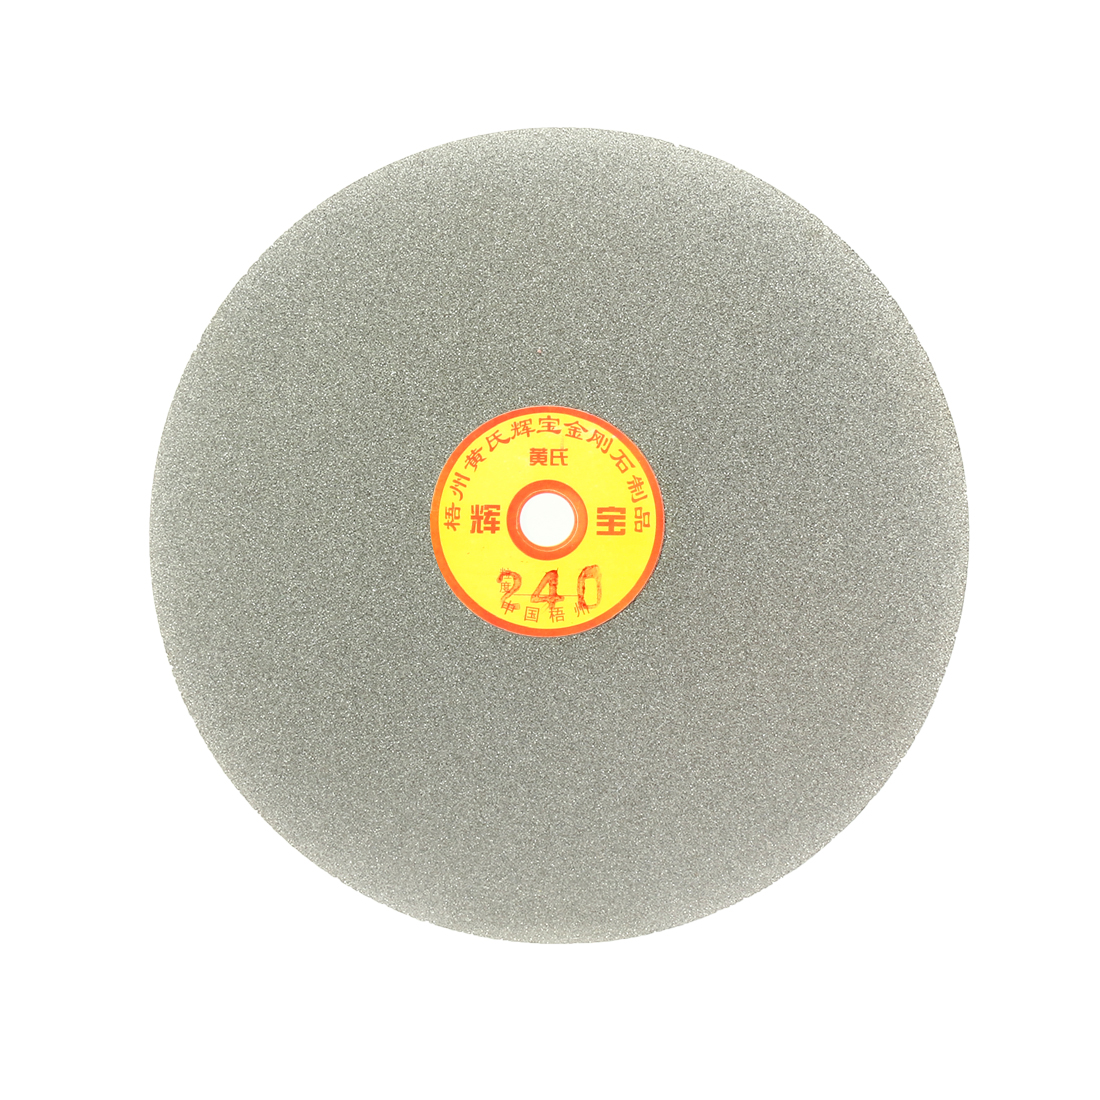 180mm 7-inch Grit 240 Diamond Coated Flat Lap Disk Wheel Grinding Sanding Disc